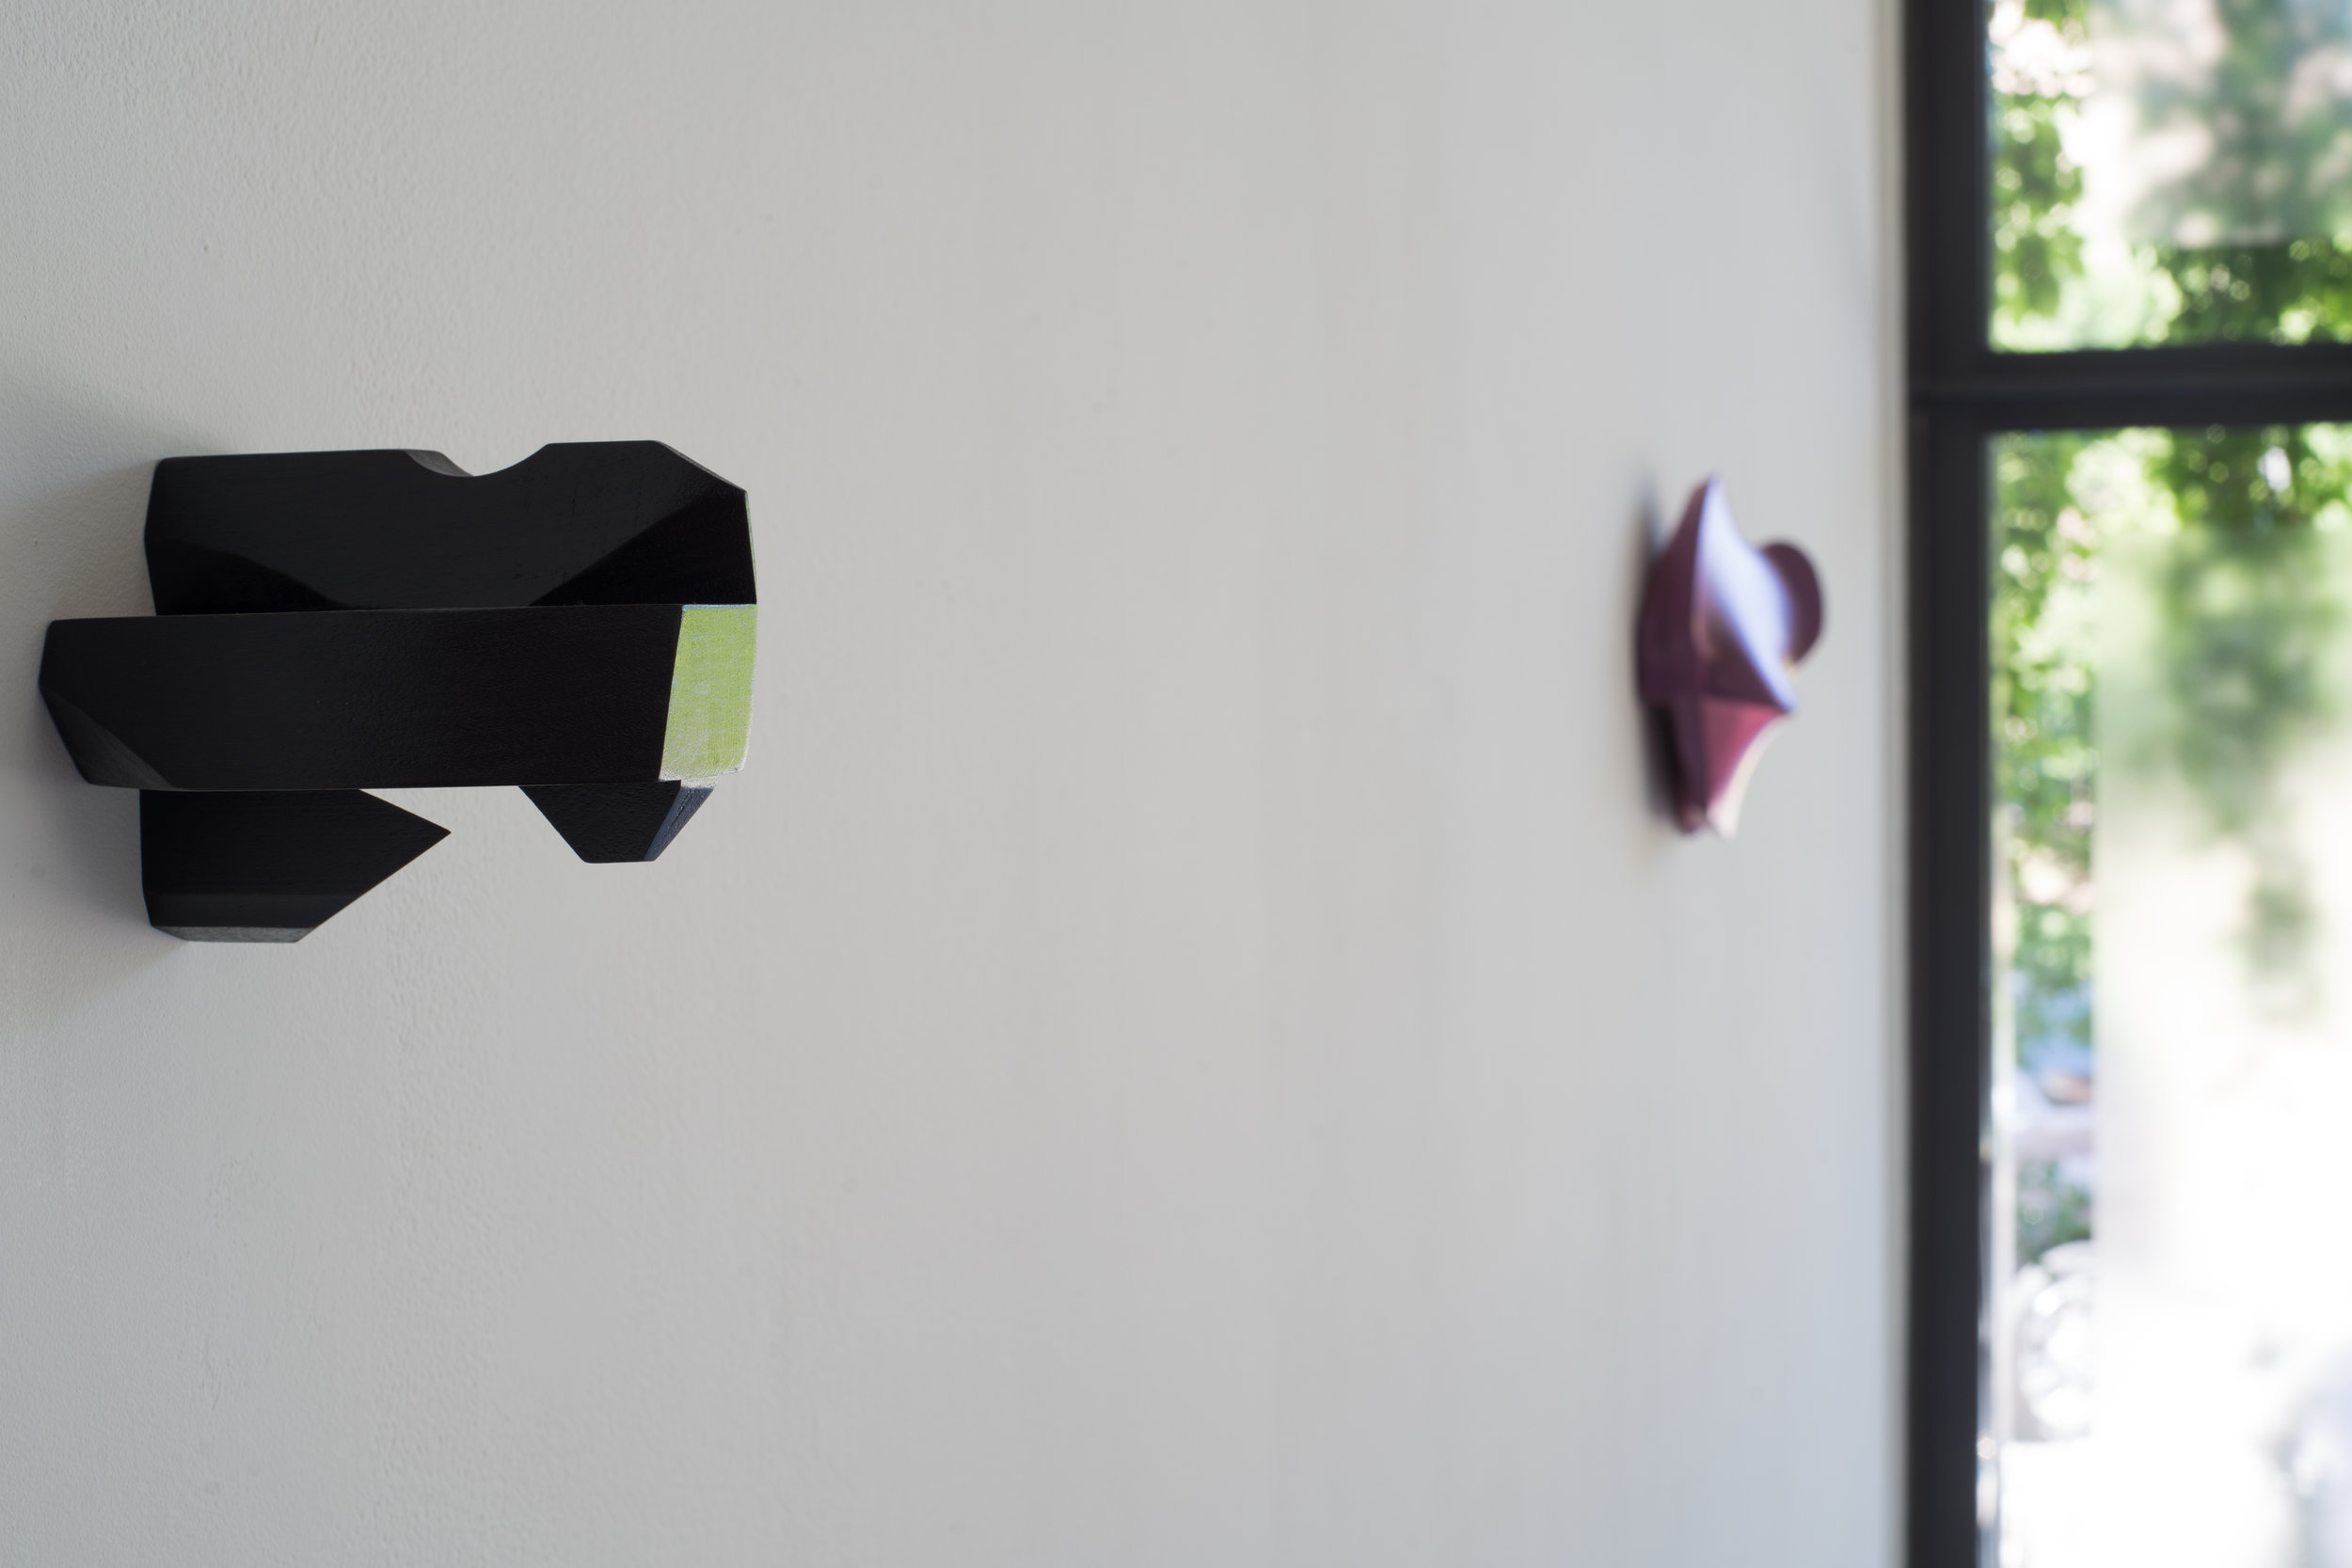 Dye and Shellac on  Walnut, 4.25 x 4.5 x 4.75 inches